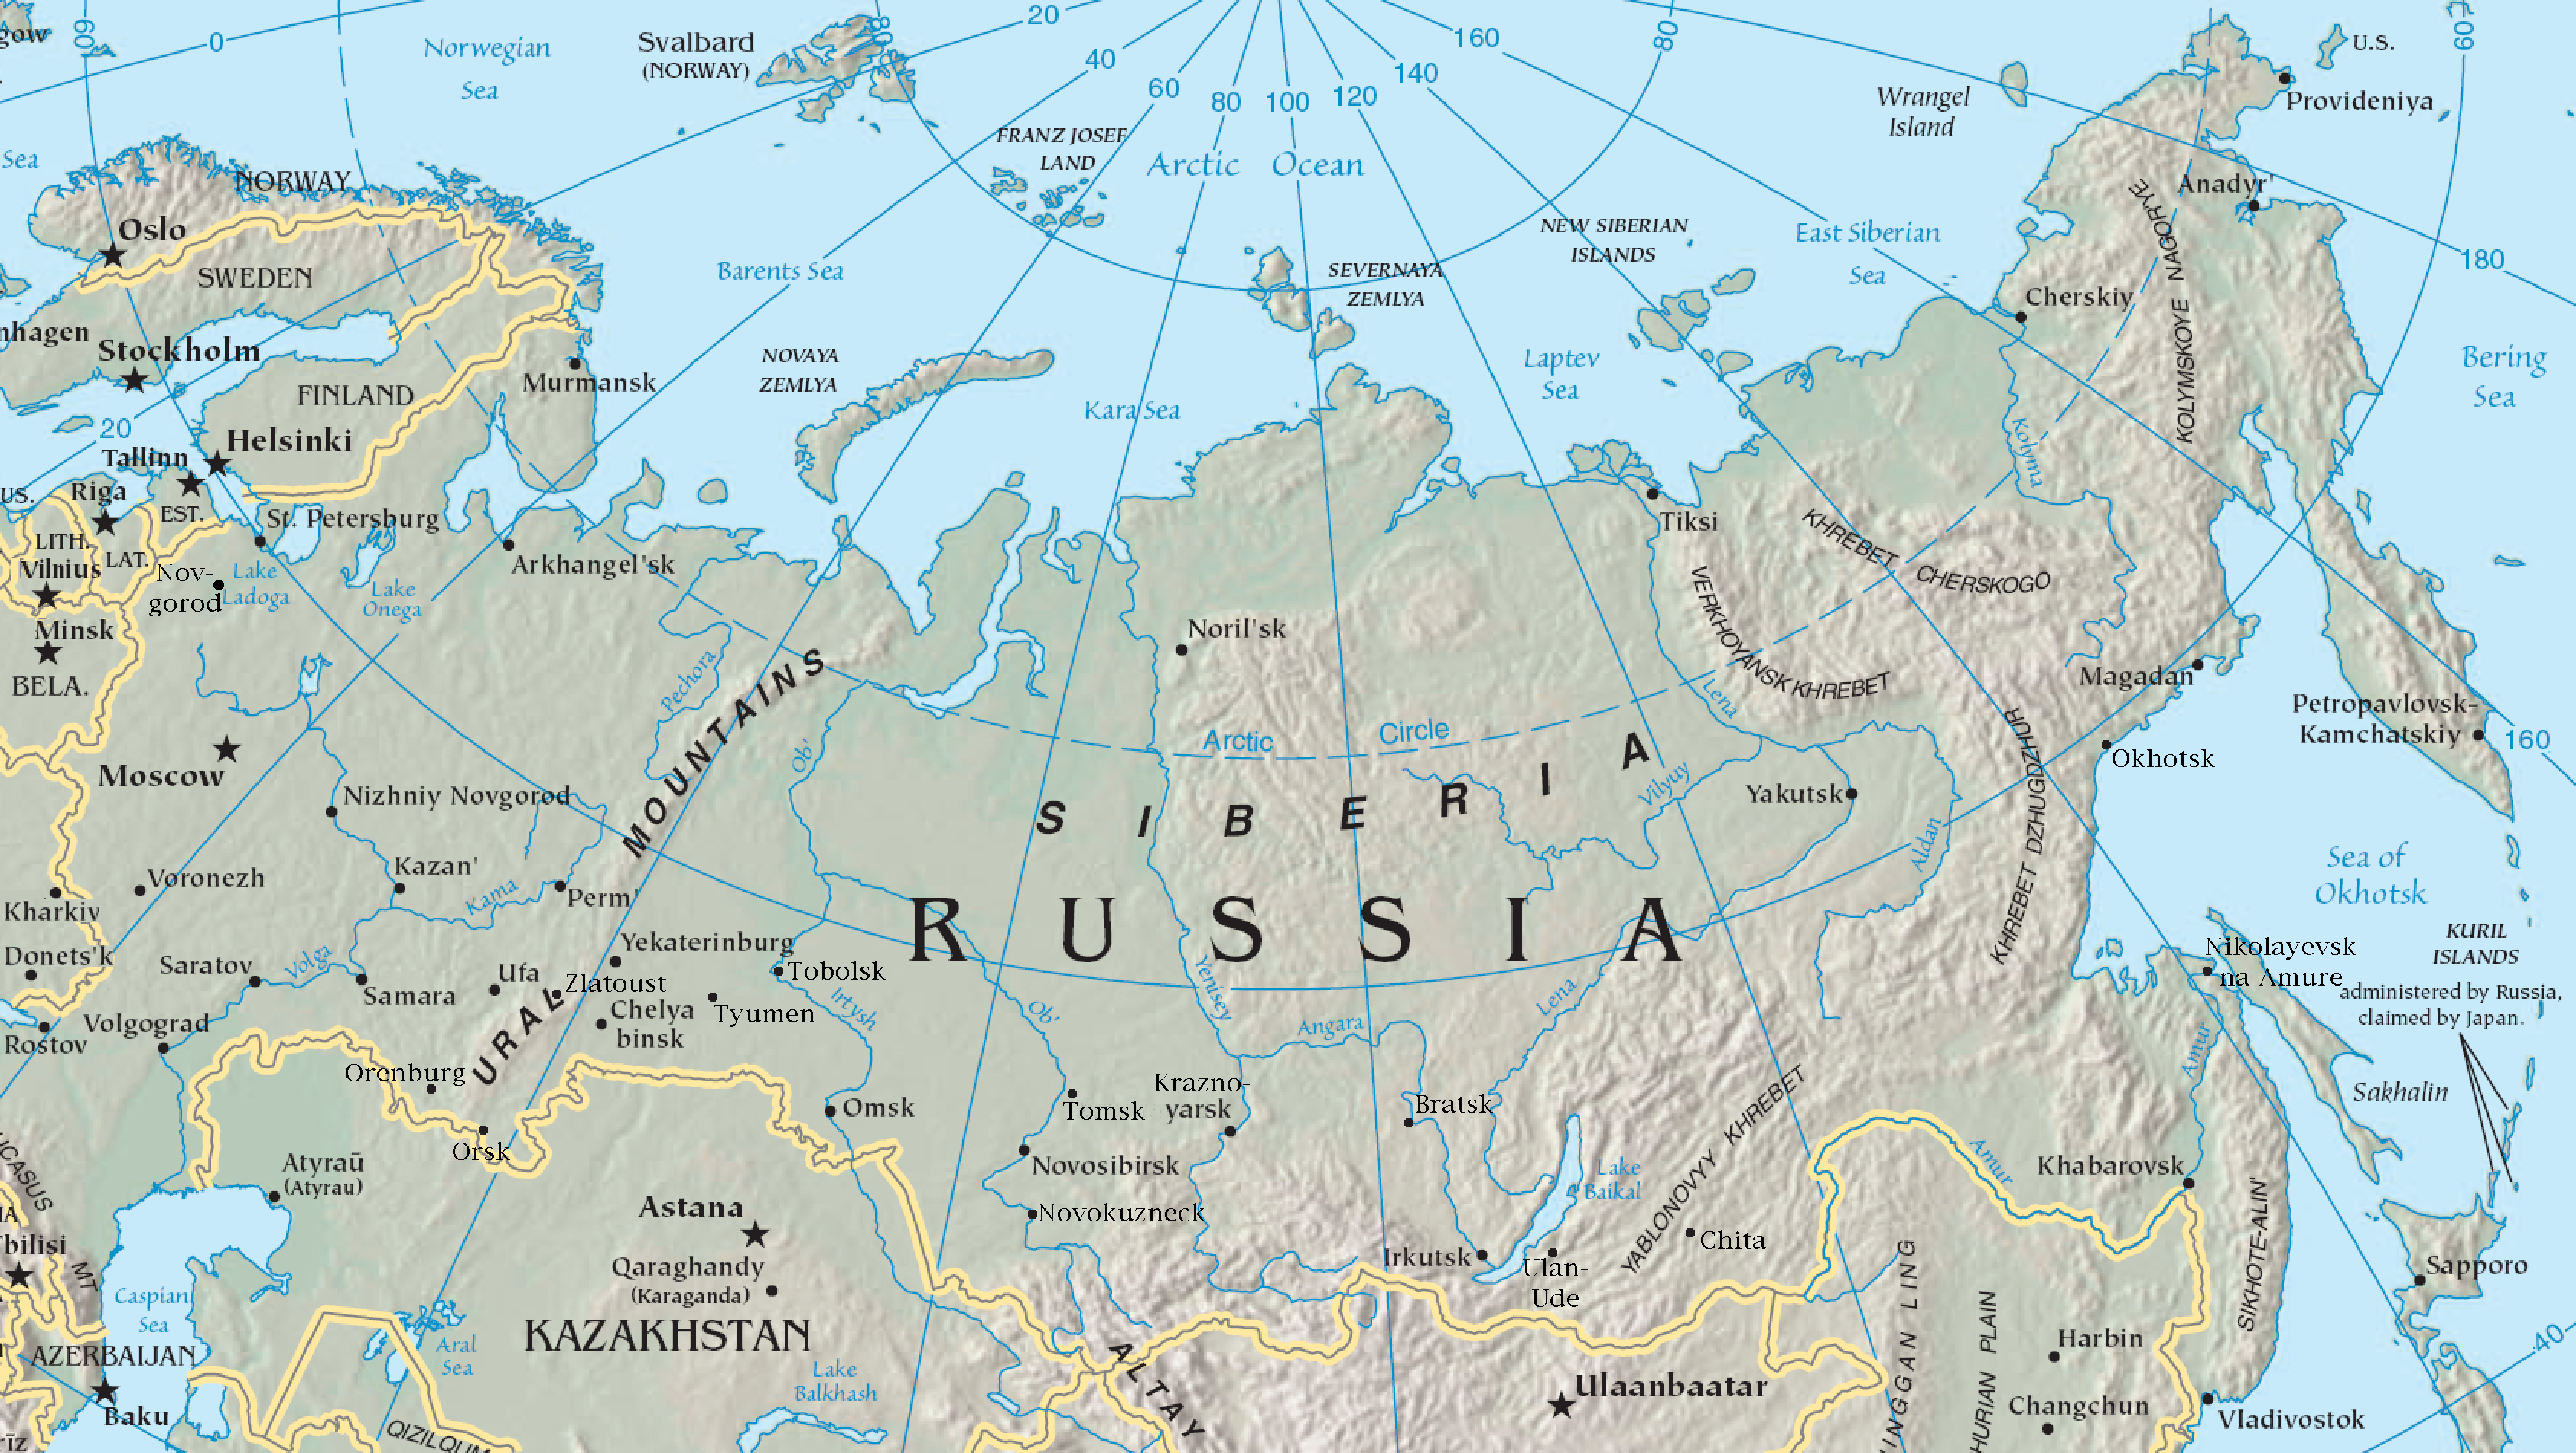 Asia Map Siberia.Fajl Siberia Topo144 Png Vikipediya